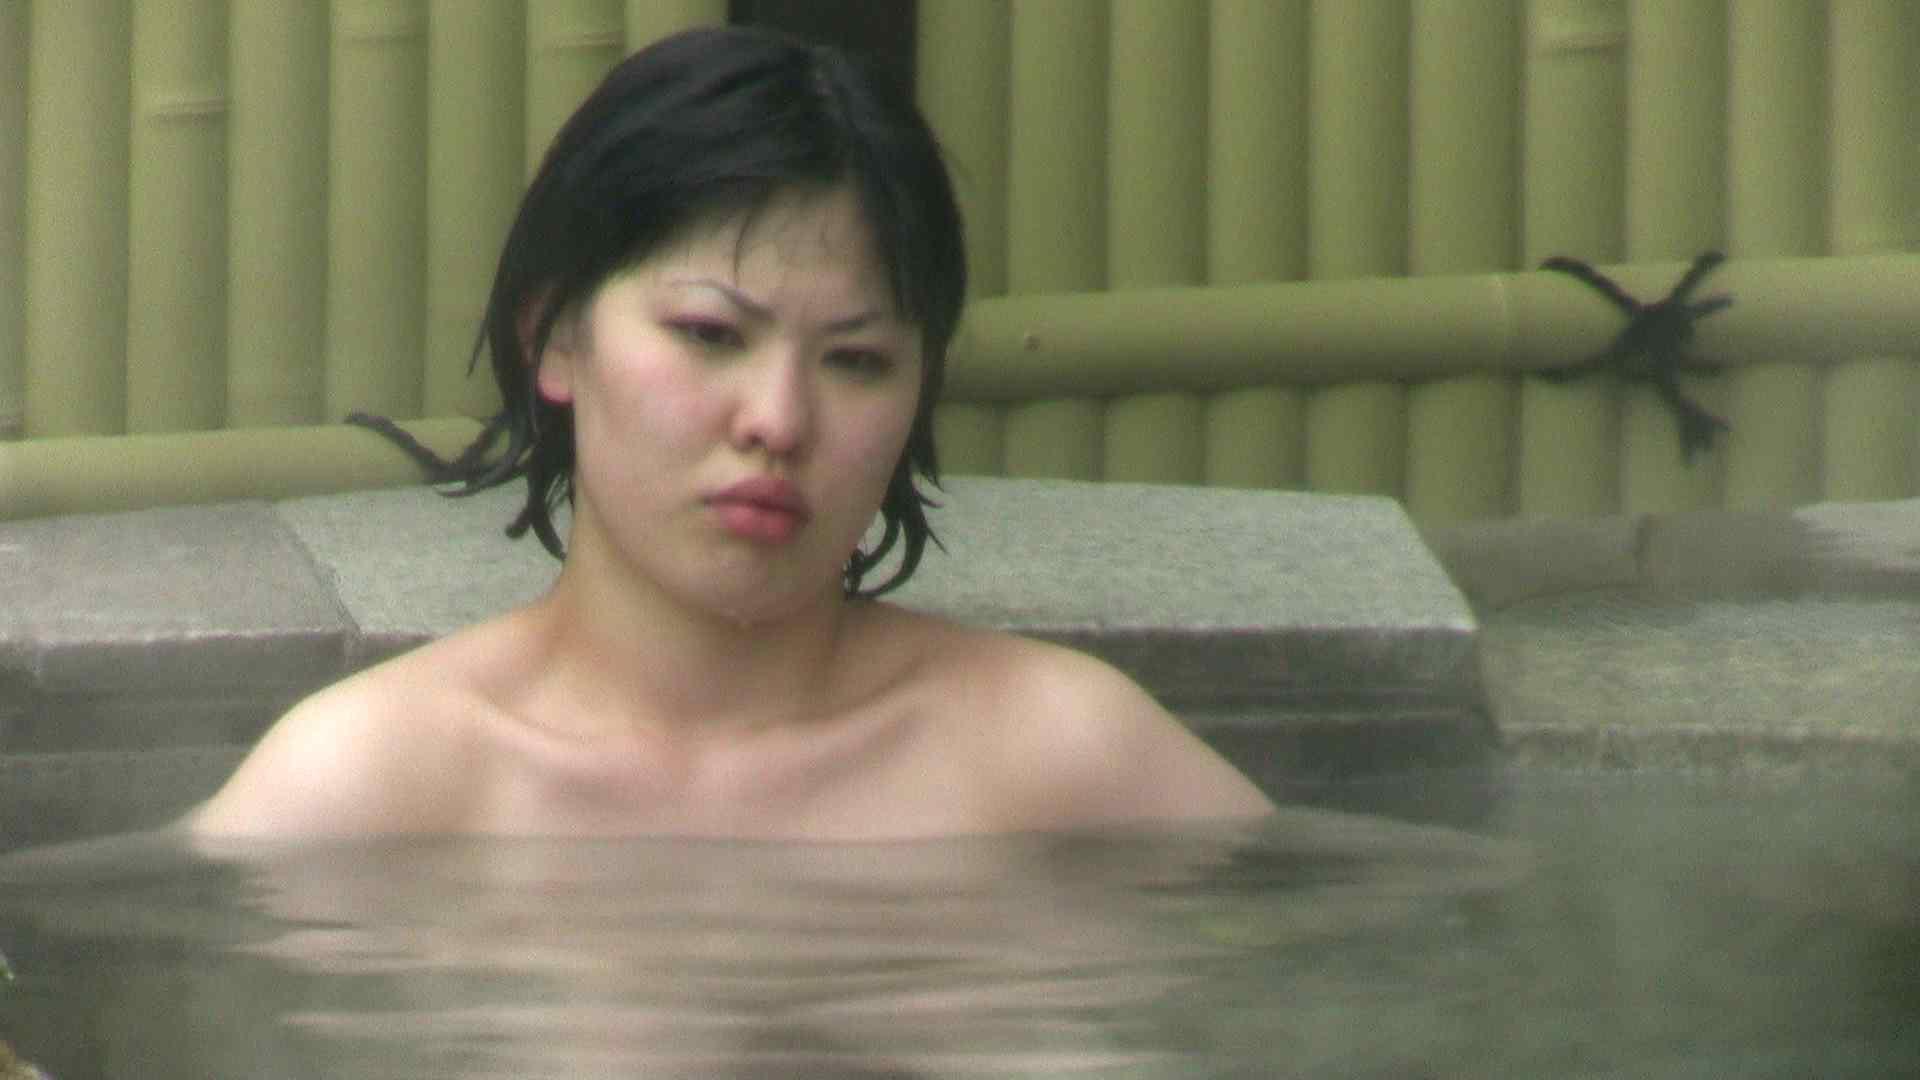 Aquaな露天風呂Vol.114 盗撮映像  72Pix 21